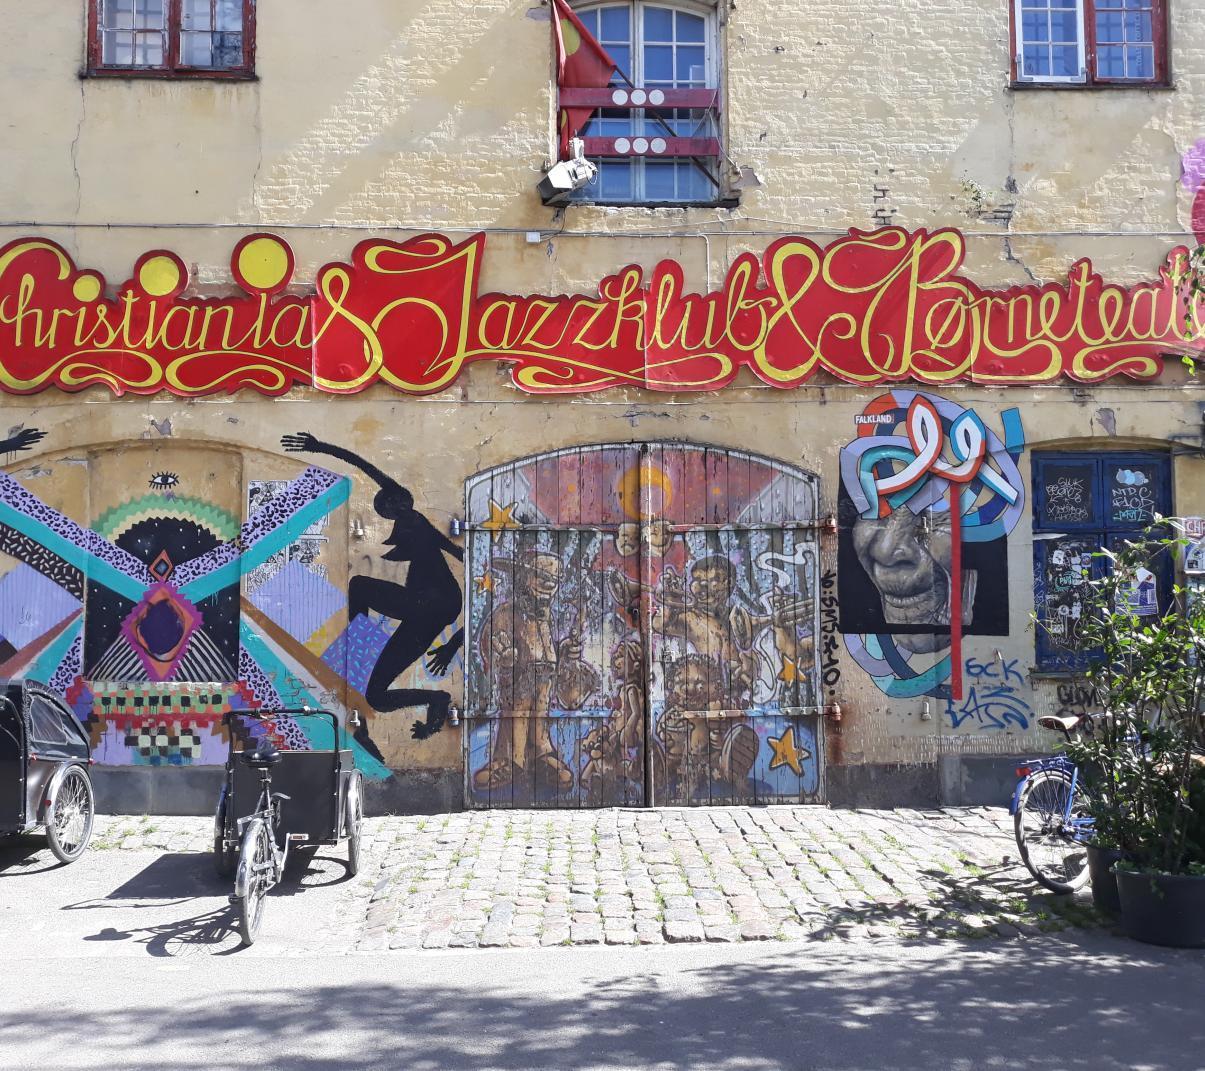 Borneteateret jazz club (Luboš Soukup, 2020)